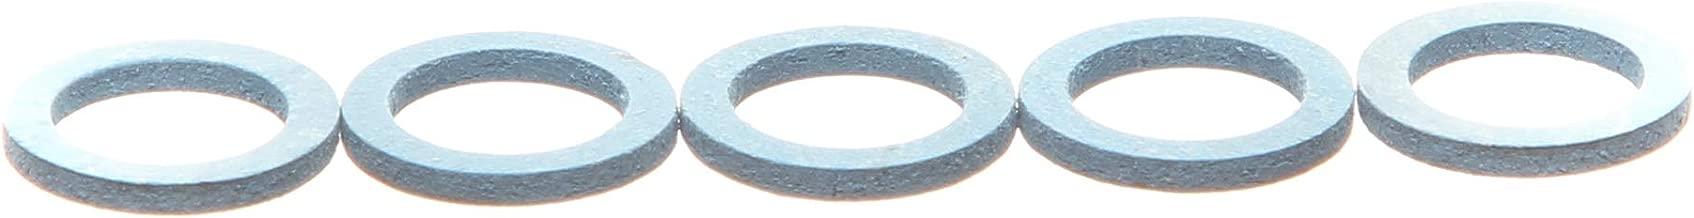 REPLACEMENTKITS.COM - Fits Lower Gear Case Gasket 5 Pack Mercury & Mercruiser 12-19183 18-2244 18-2945 & 31170 -